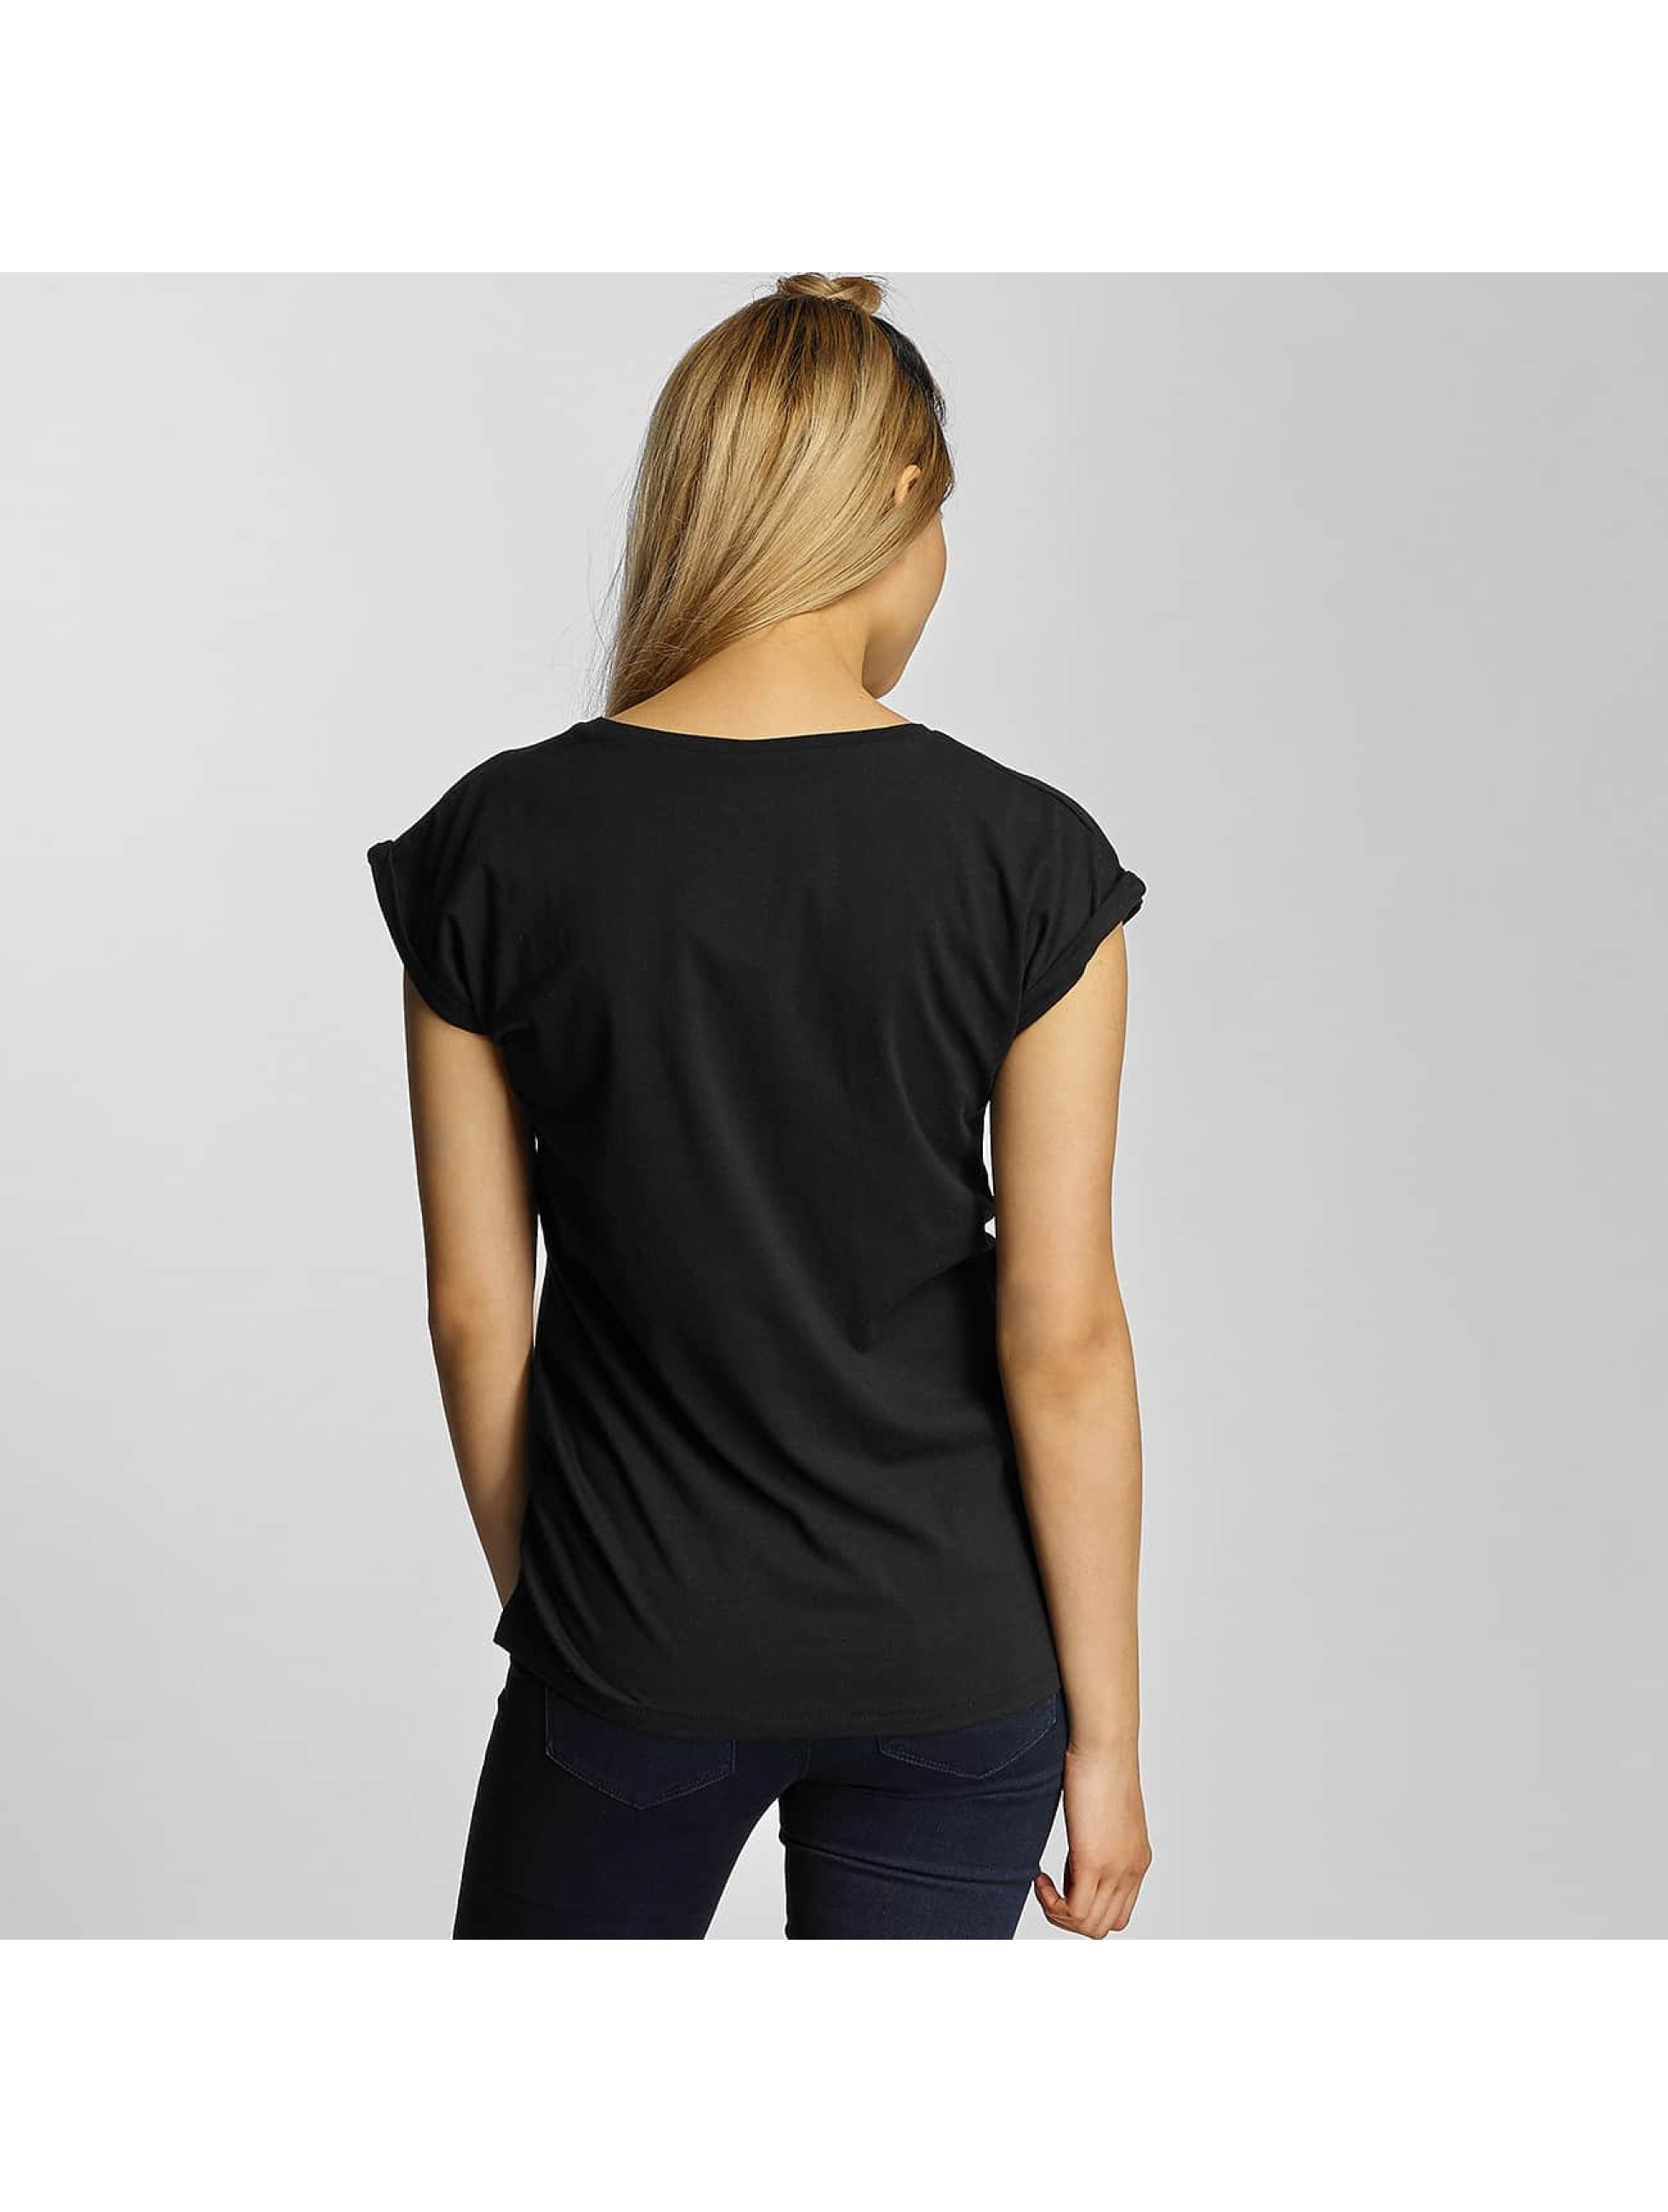 Merchcode T-Shirt Korn Cracked Glass schwarz